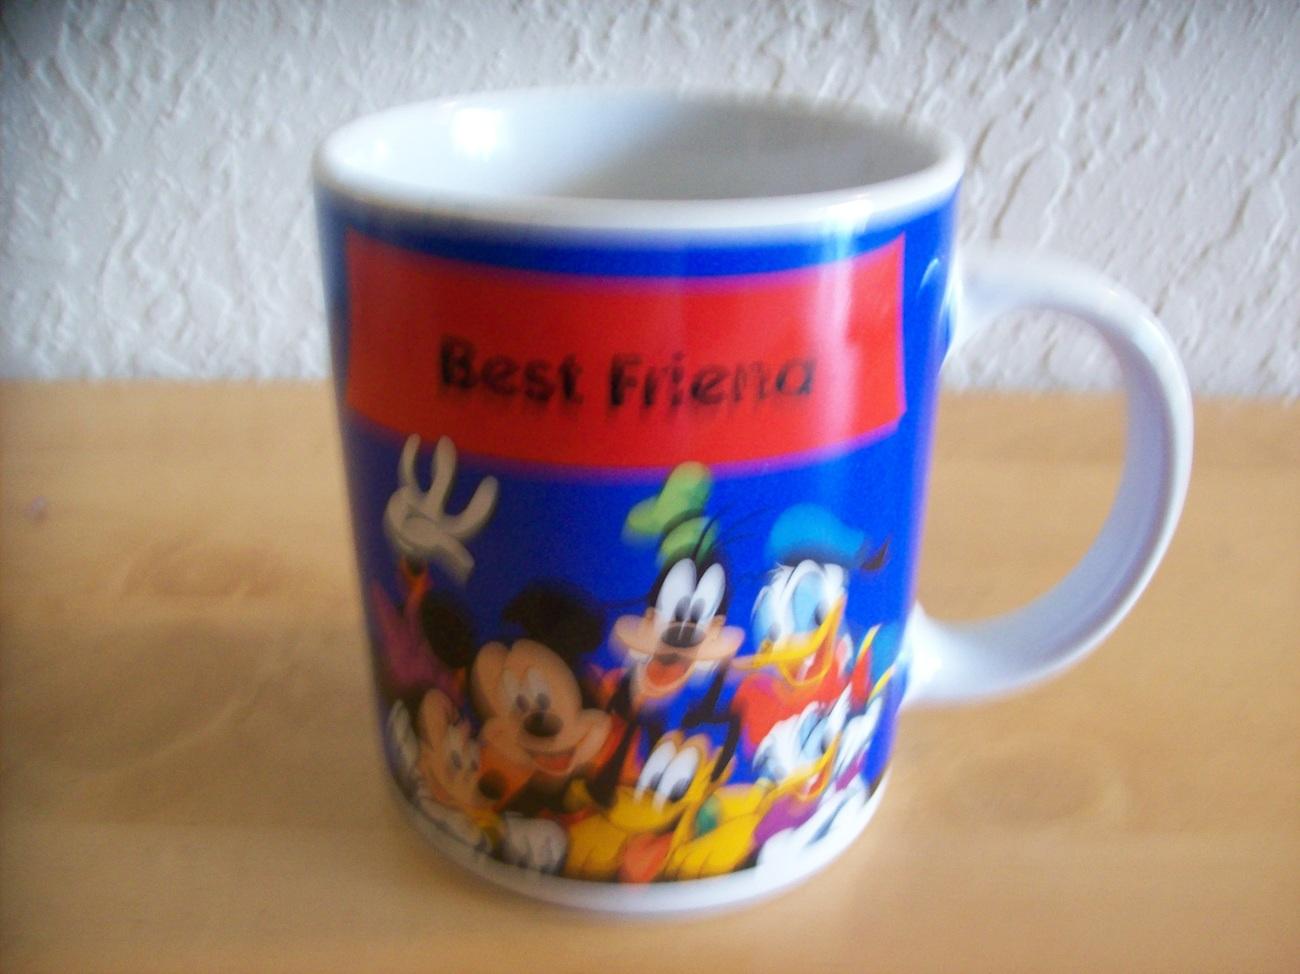 Disney Mickey Mouse Best Friends Coffee Mug